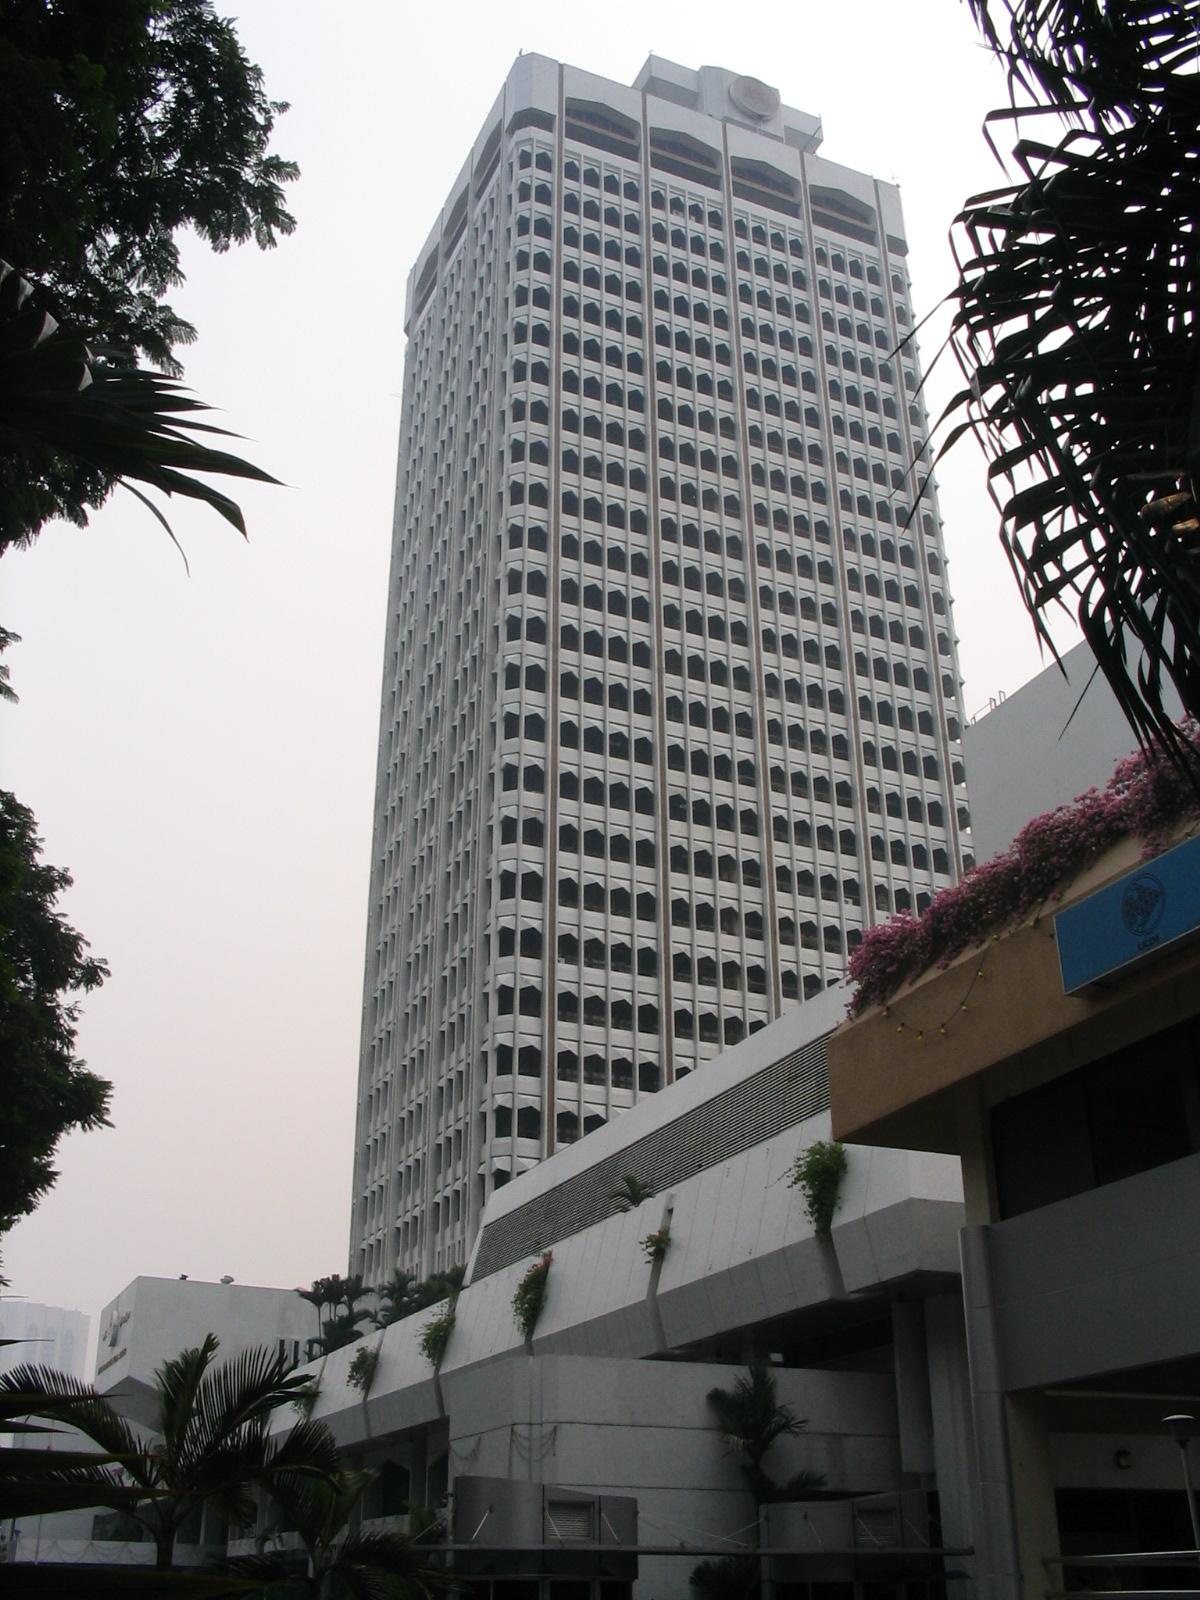 The Kuala Lumpur City Hall